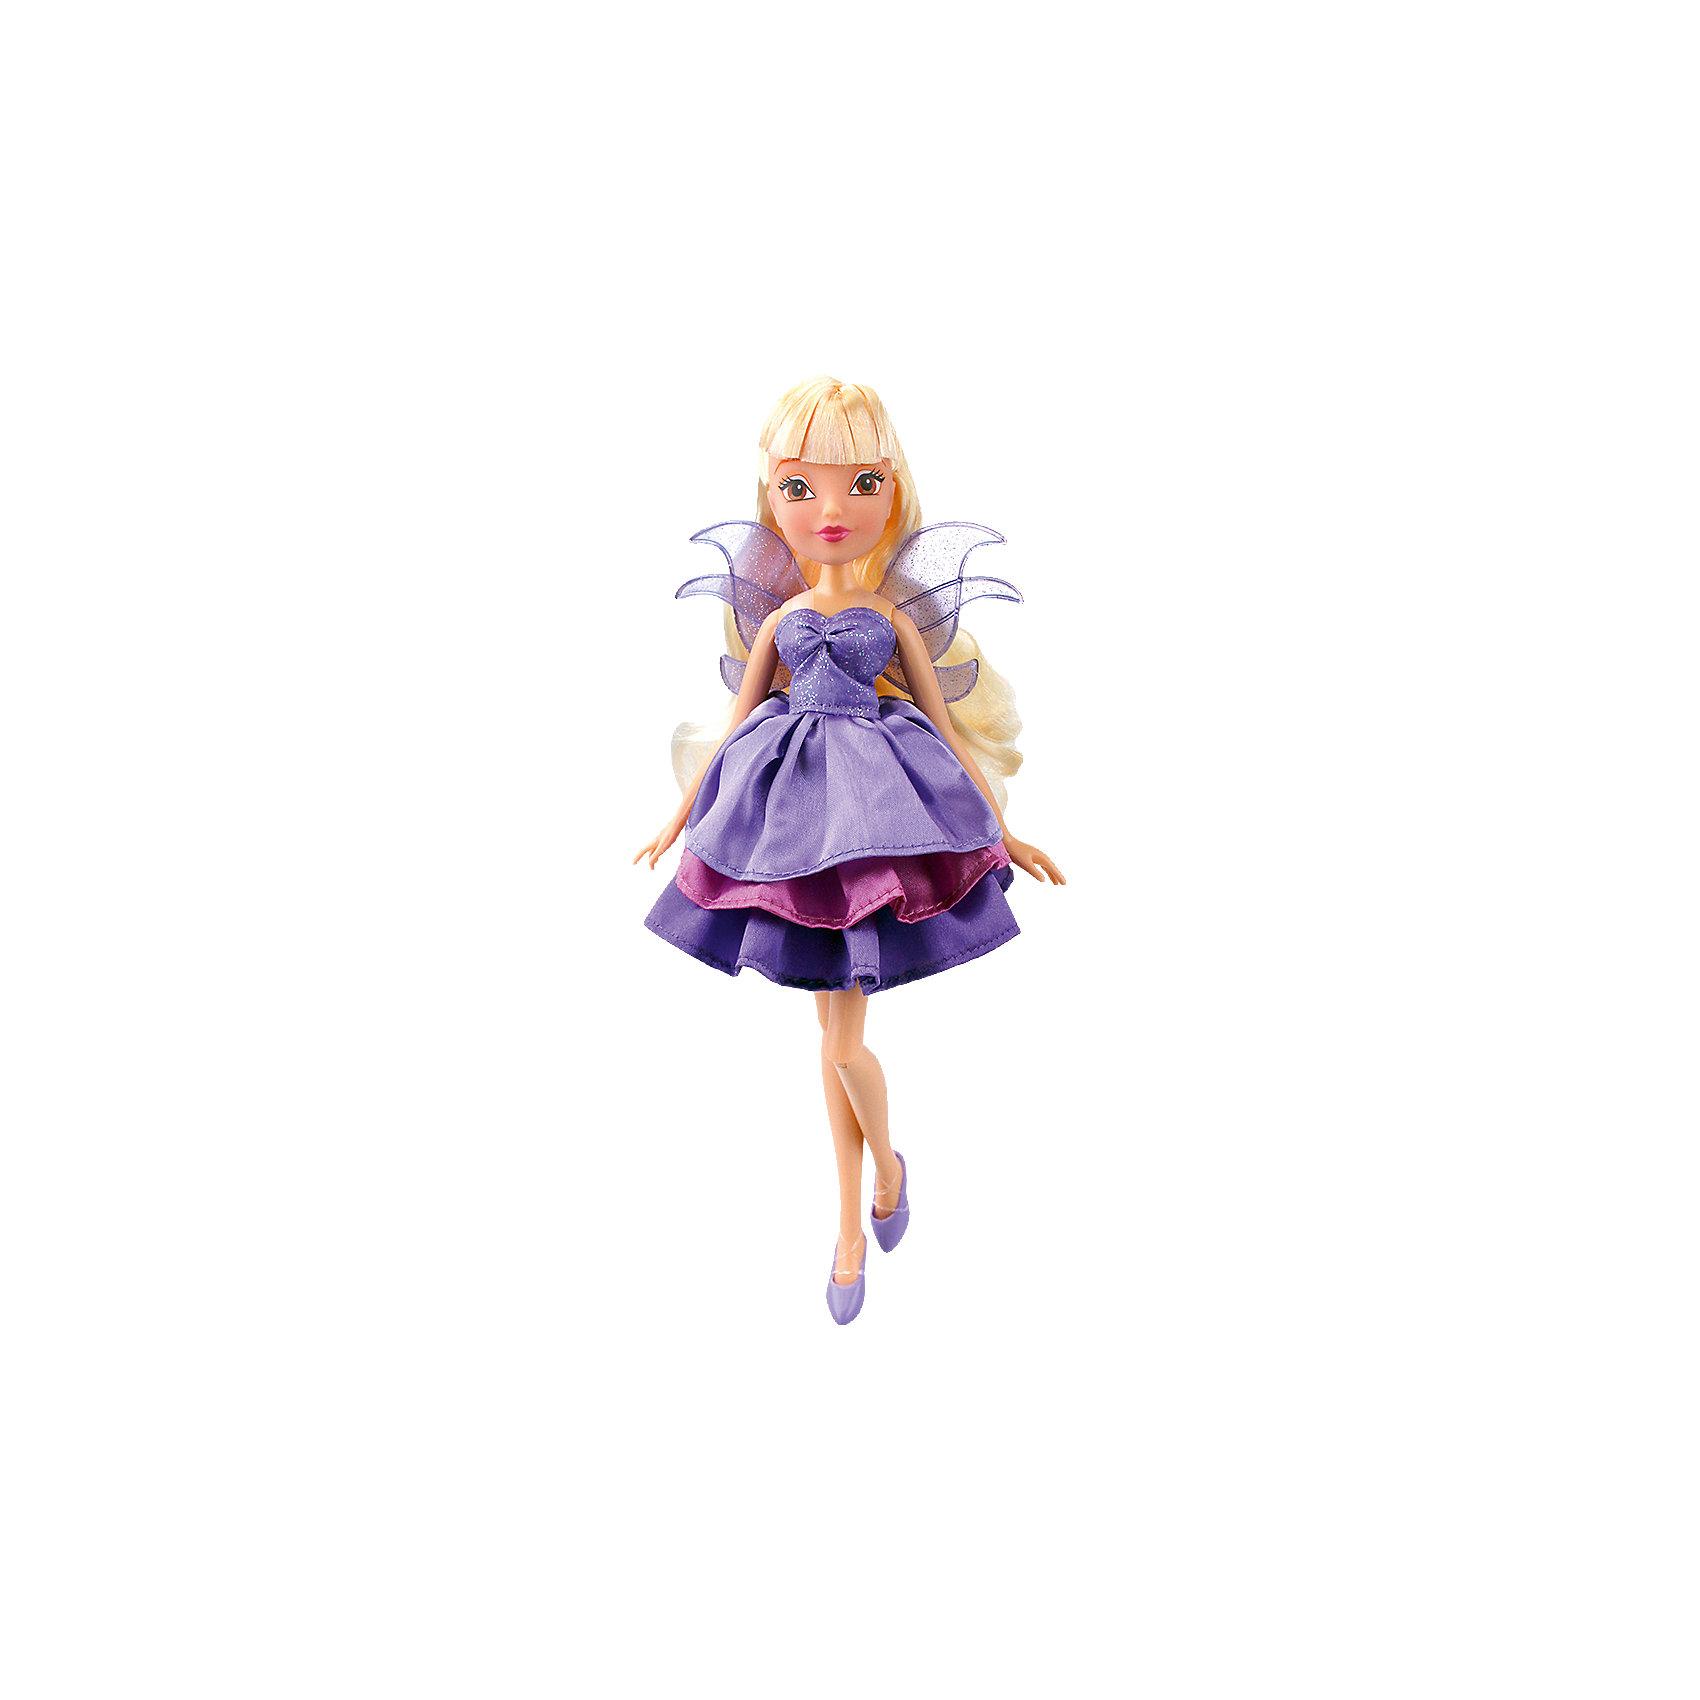 Кукла Стелла Волшебное платье, Winx ClubКуклы-модели<br>Doll Winx Club Magic dress, Stella<br><br>Ширина мм: 60<br>Глубина мм: 355<br>Высота мм: 210<br>Вес г: 304<br>Возраст от месяцев: 36<br>Возраст до месяцев: 120<br>Пол: Женский<br>Возраст: Детский<br>SKU: 5532627